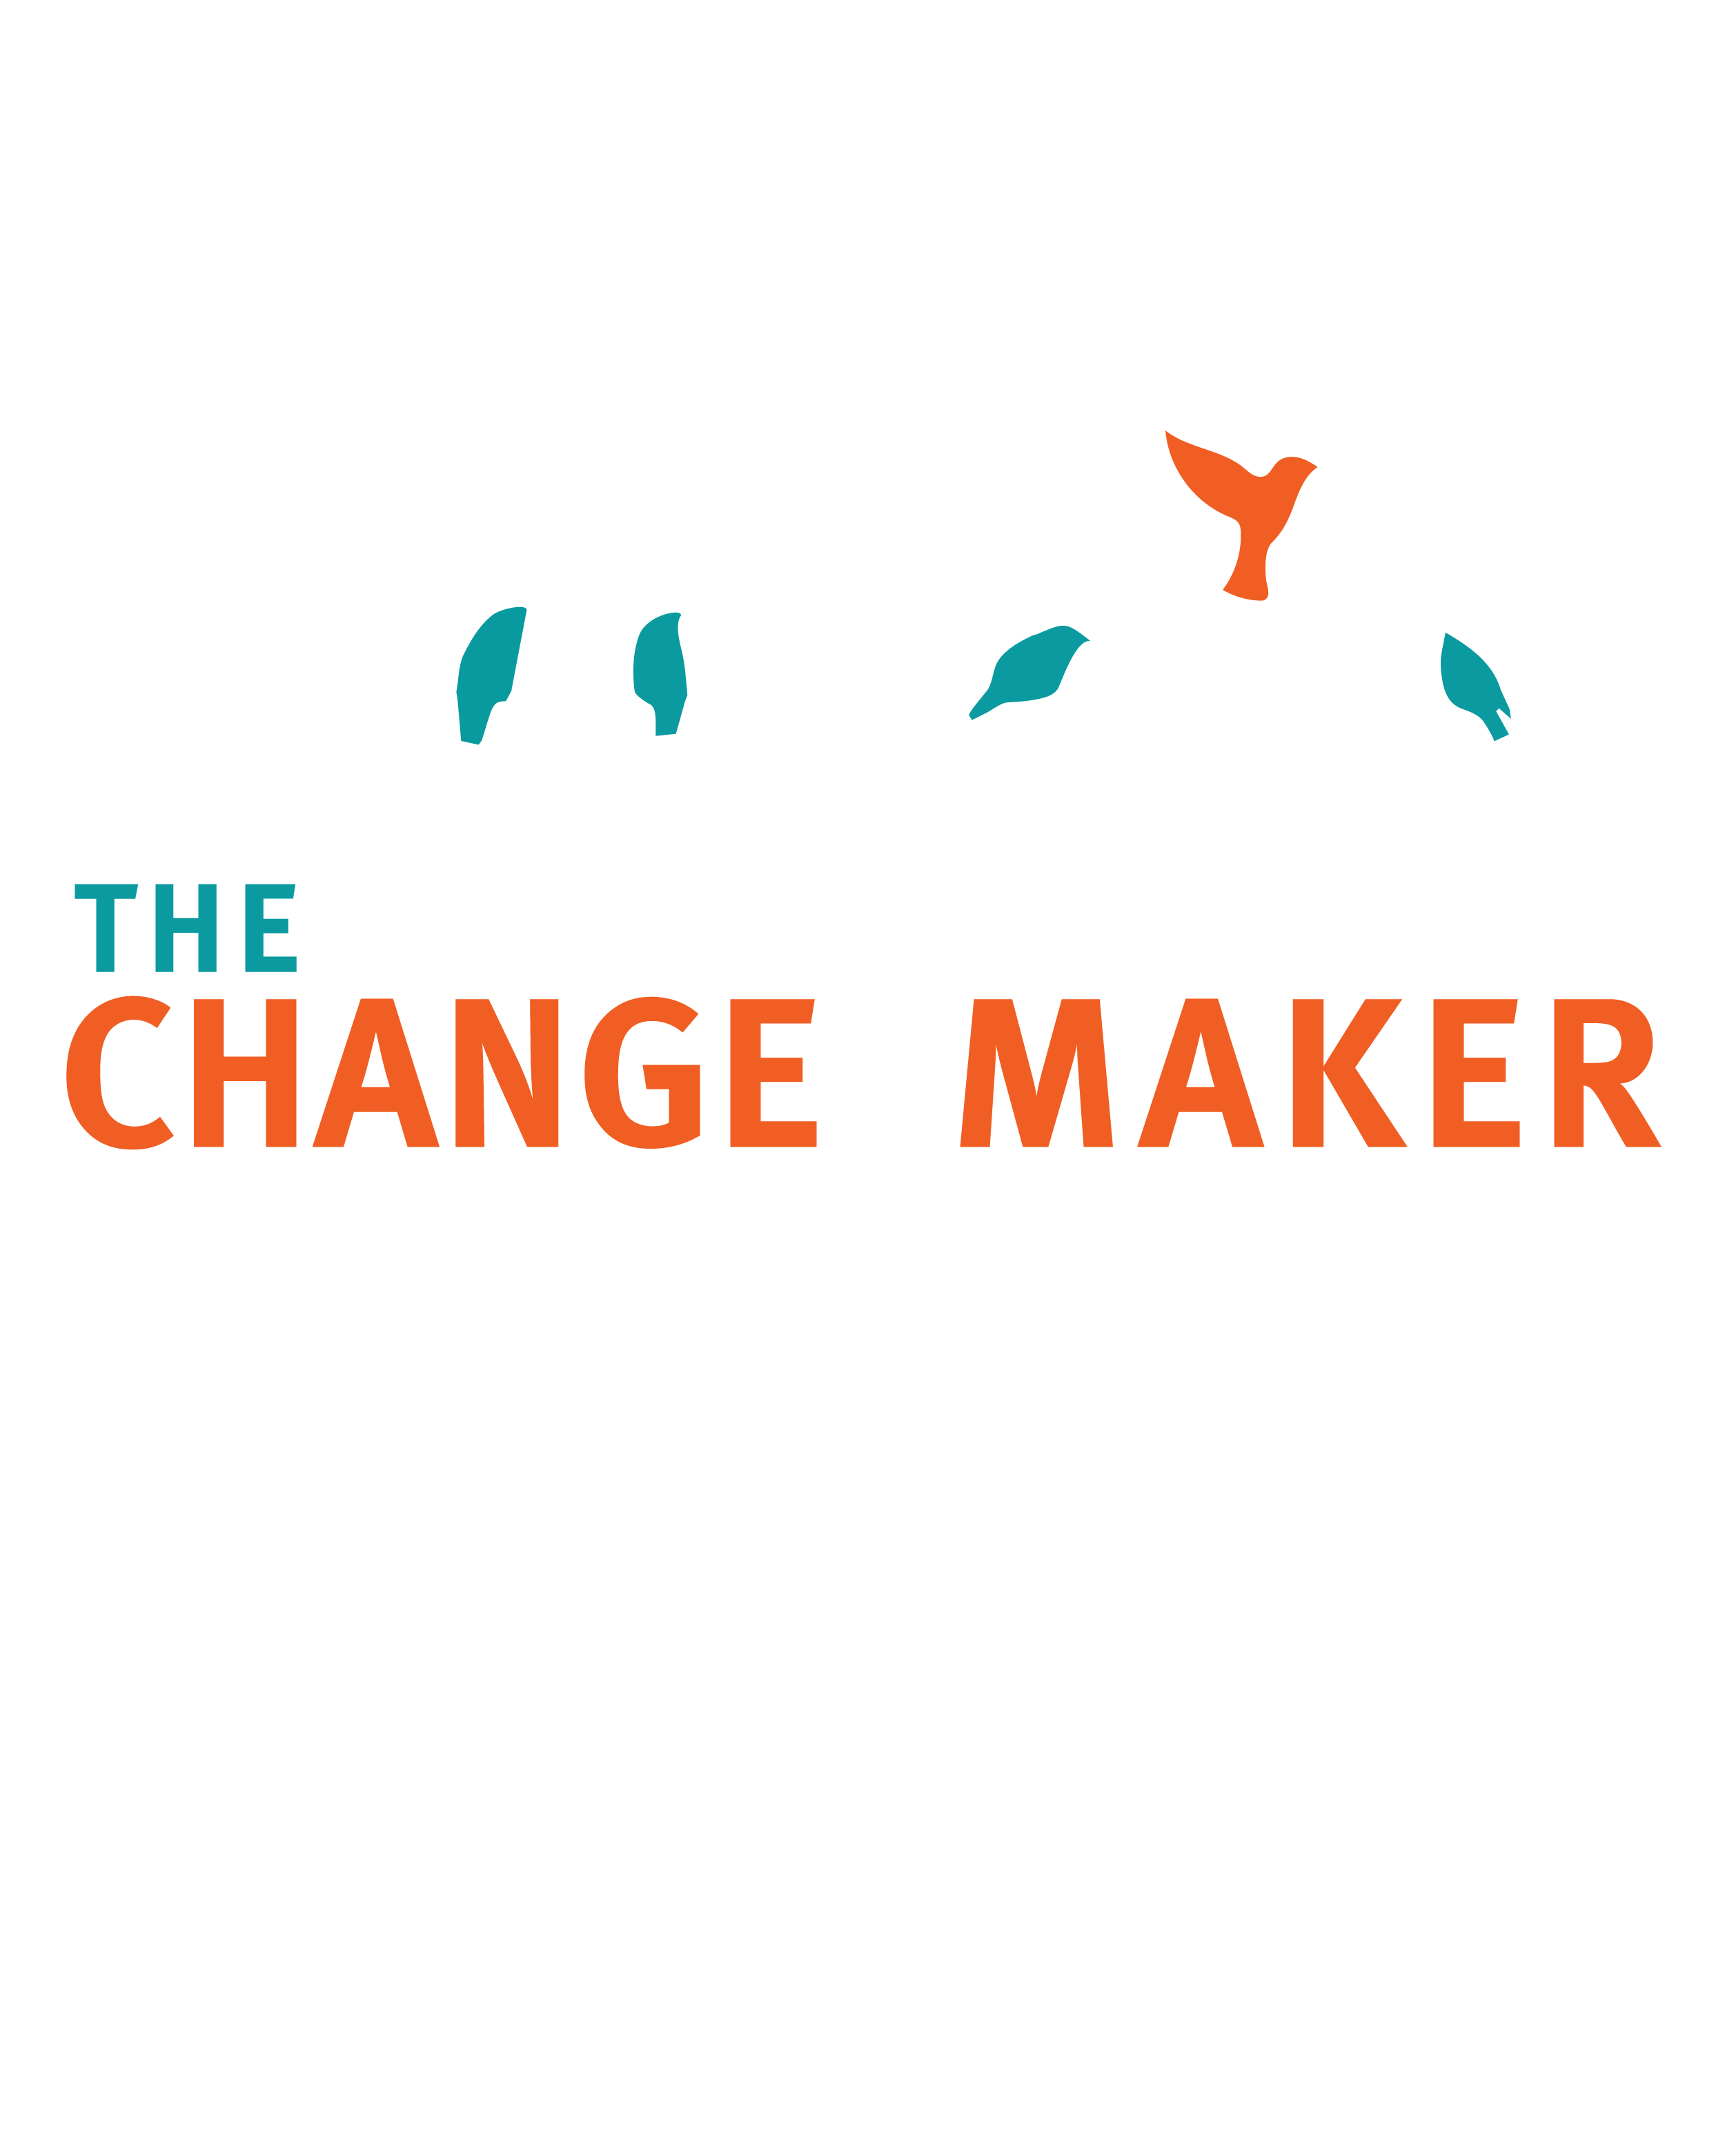 Changemaker-Initiative-Logo-Vertical-3-color-Dark-Background.png